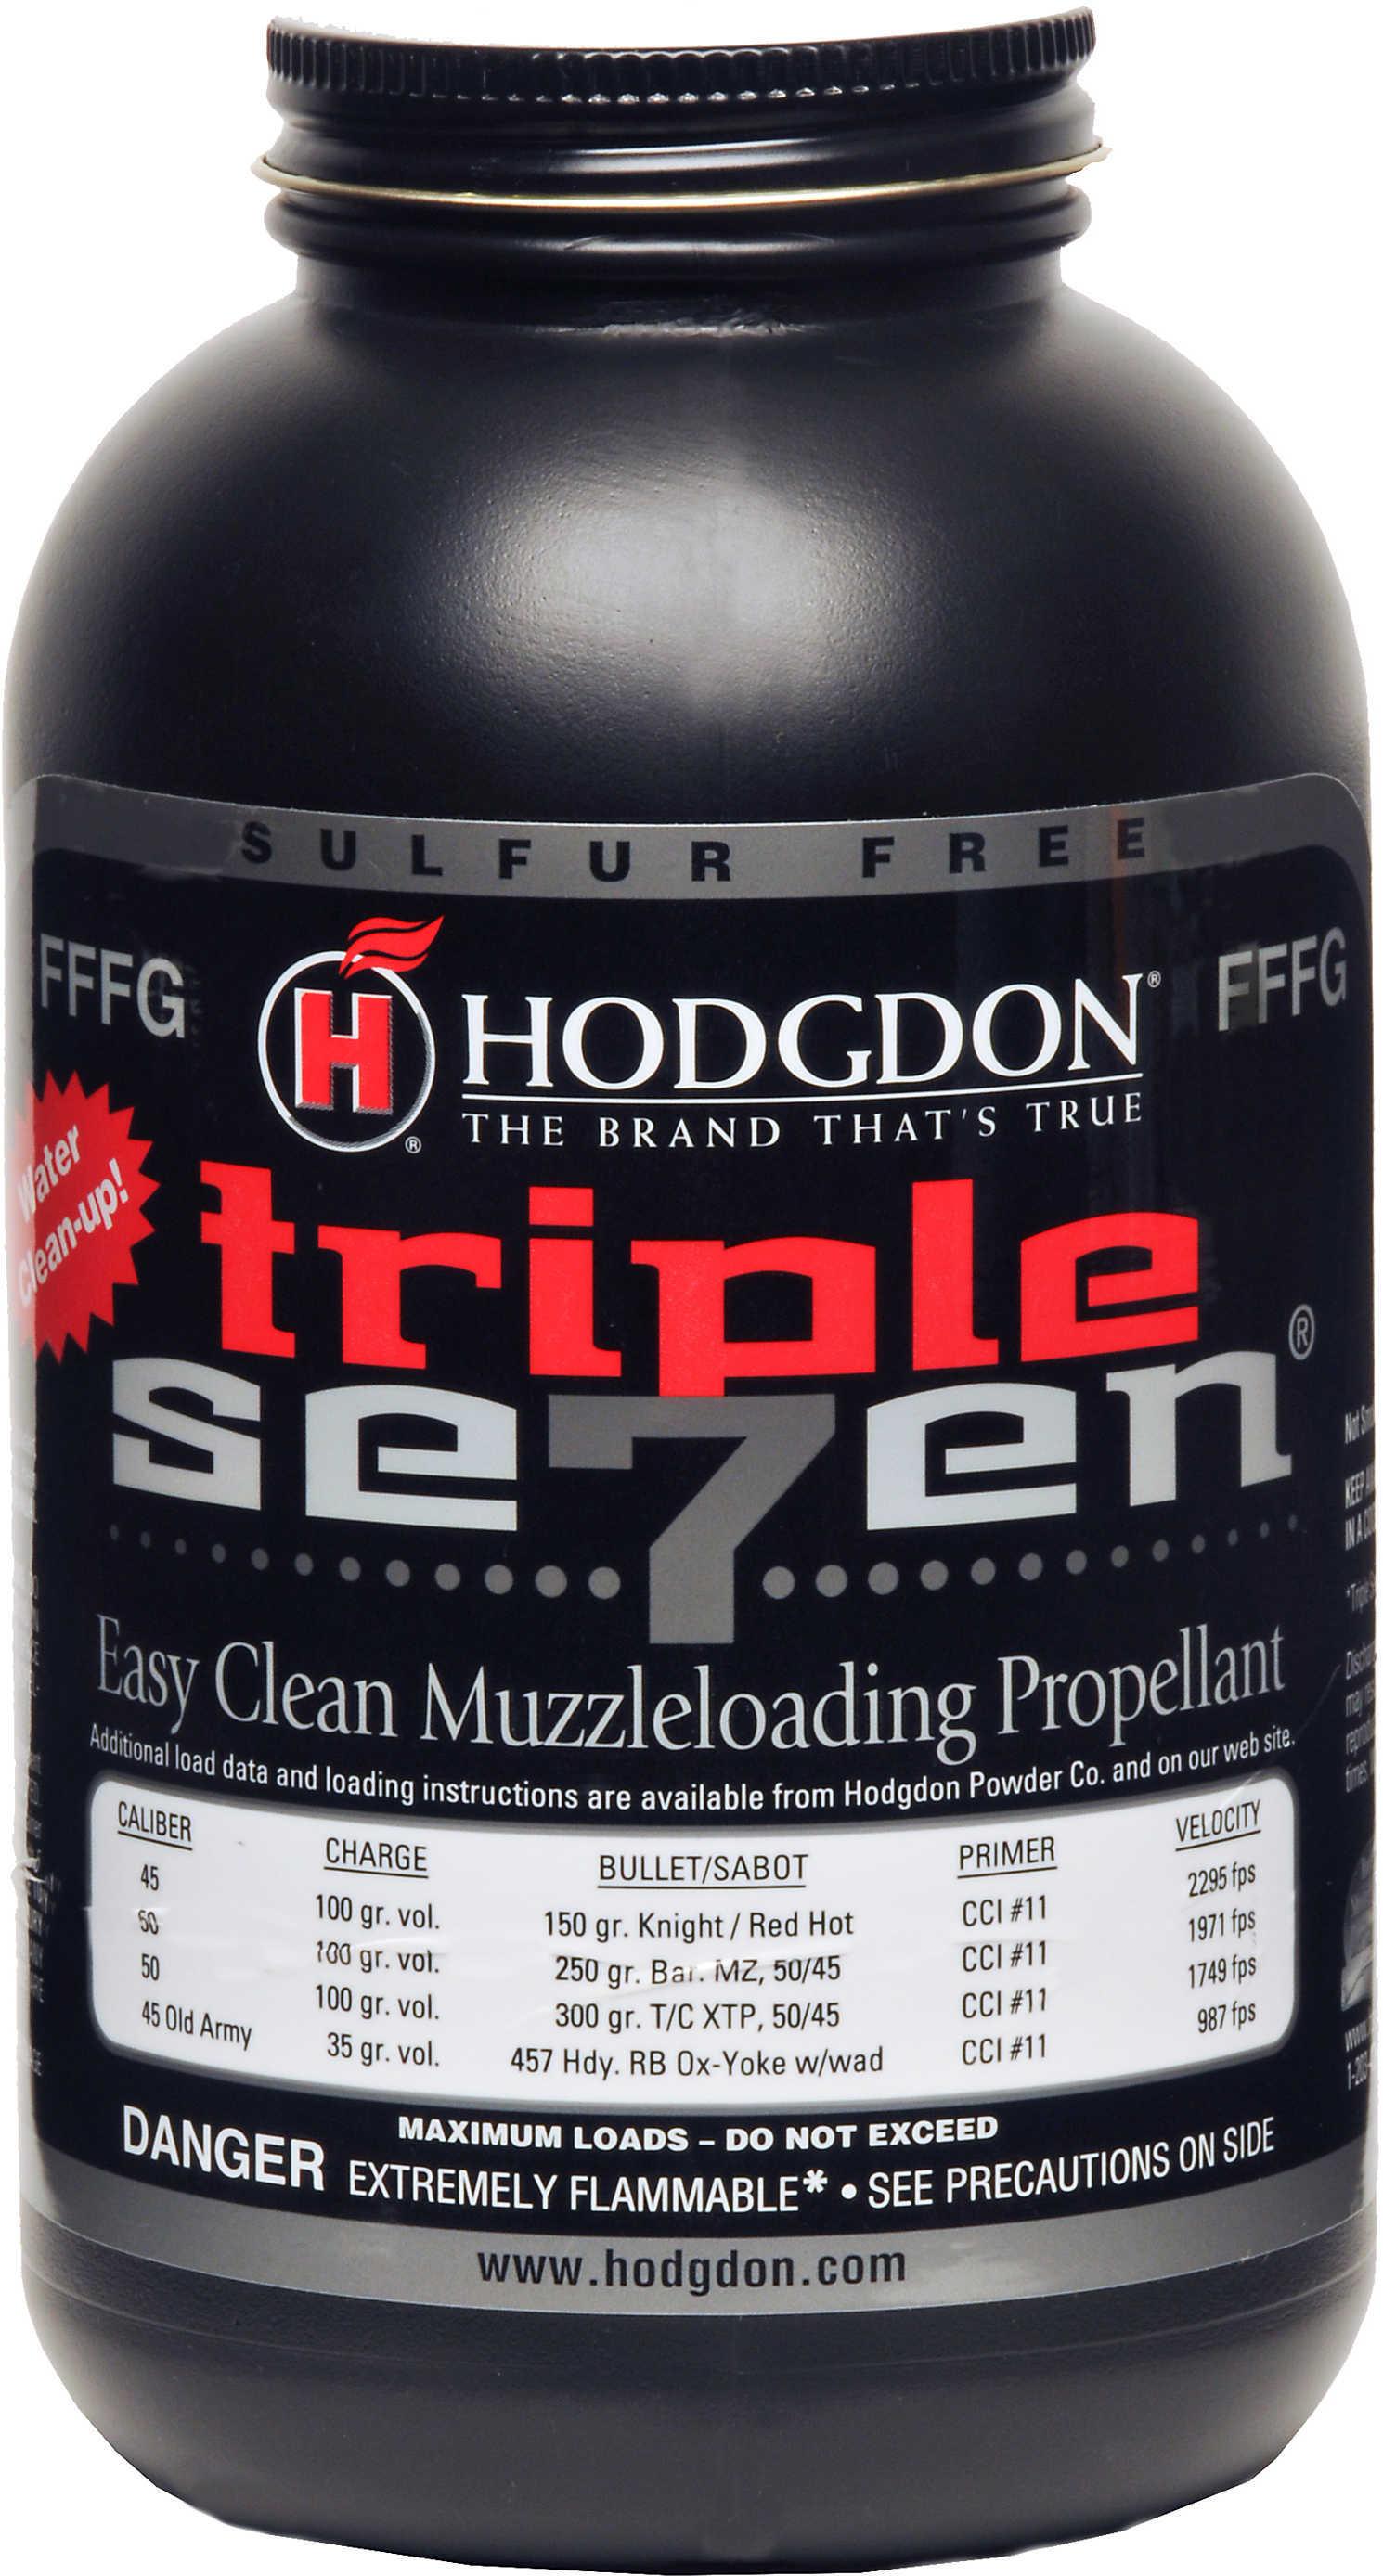 Hodgdon Triple Seven Powder FFFG 1 lb. HAZMAT Model: T73